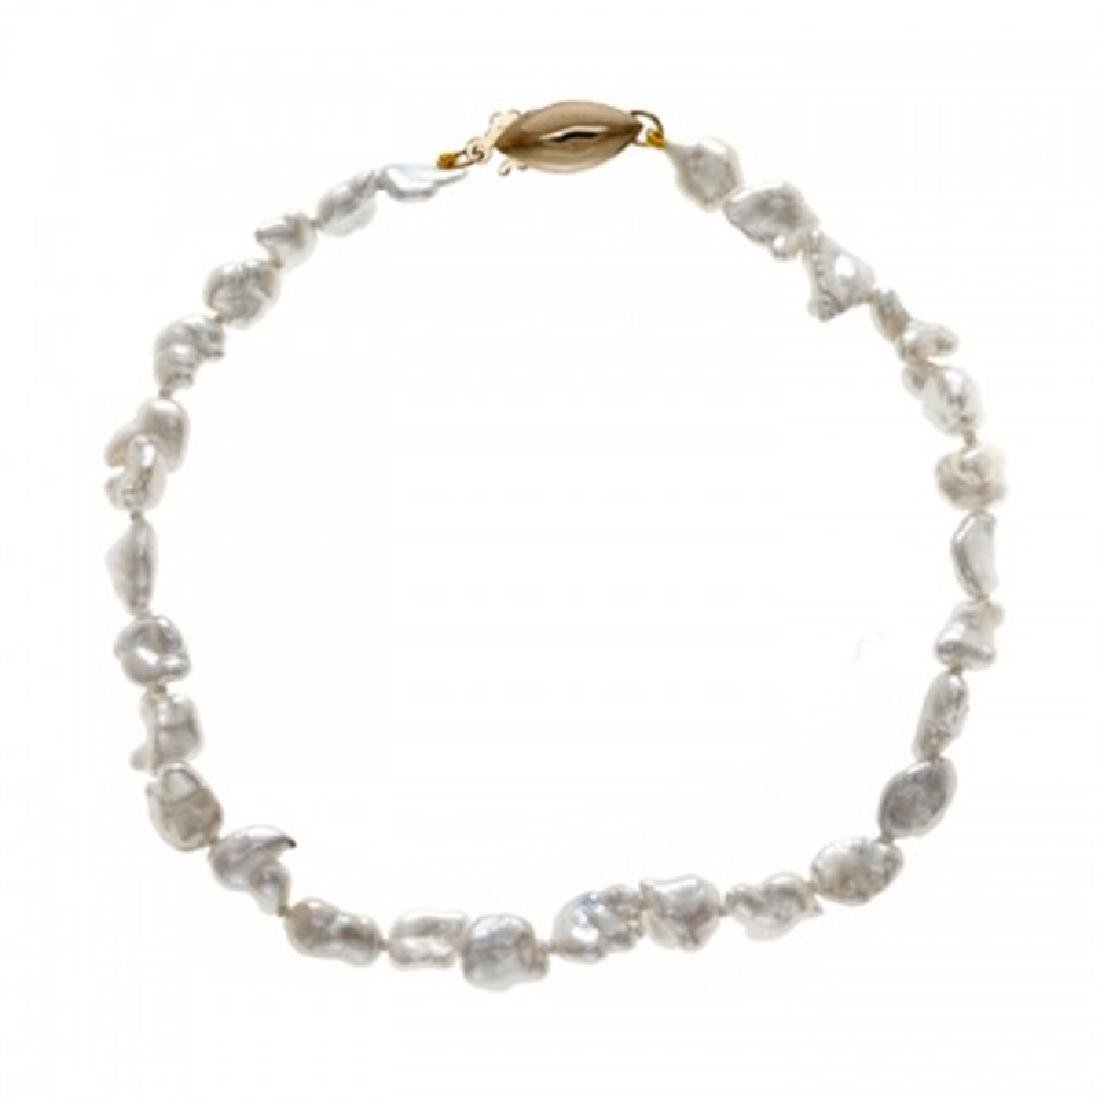 4.0-6.0mm Keshi Pearl Bracelet